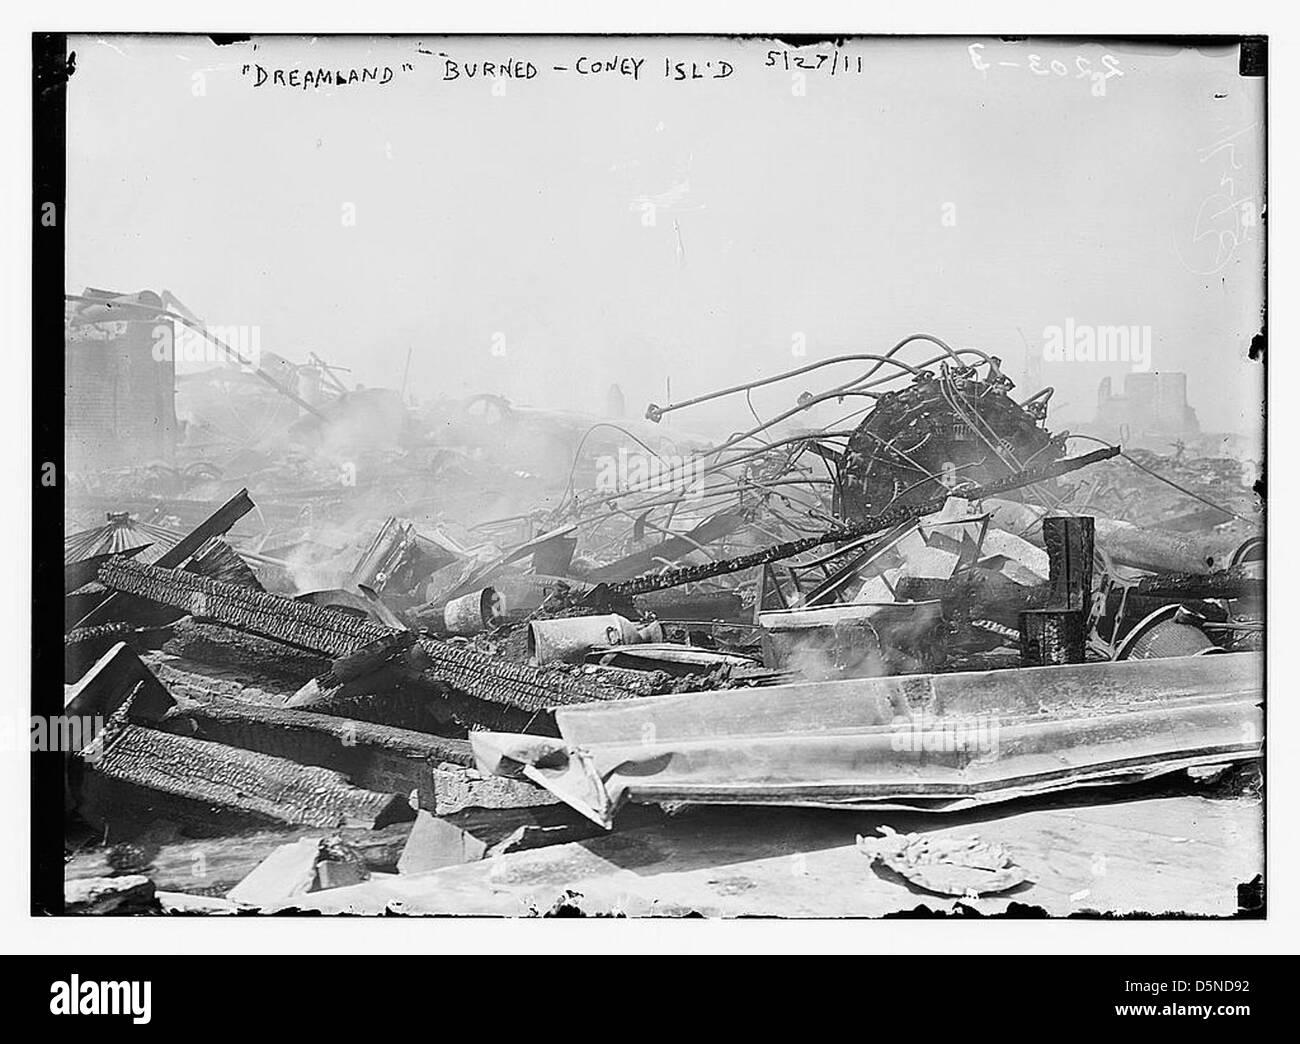 'Dreamland' quemados, Coney Island, 2/8/11 (LOC) Imagen De Stock